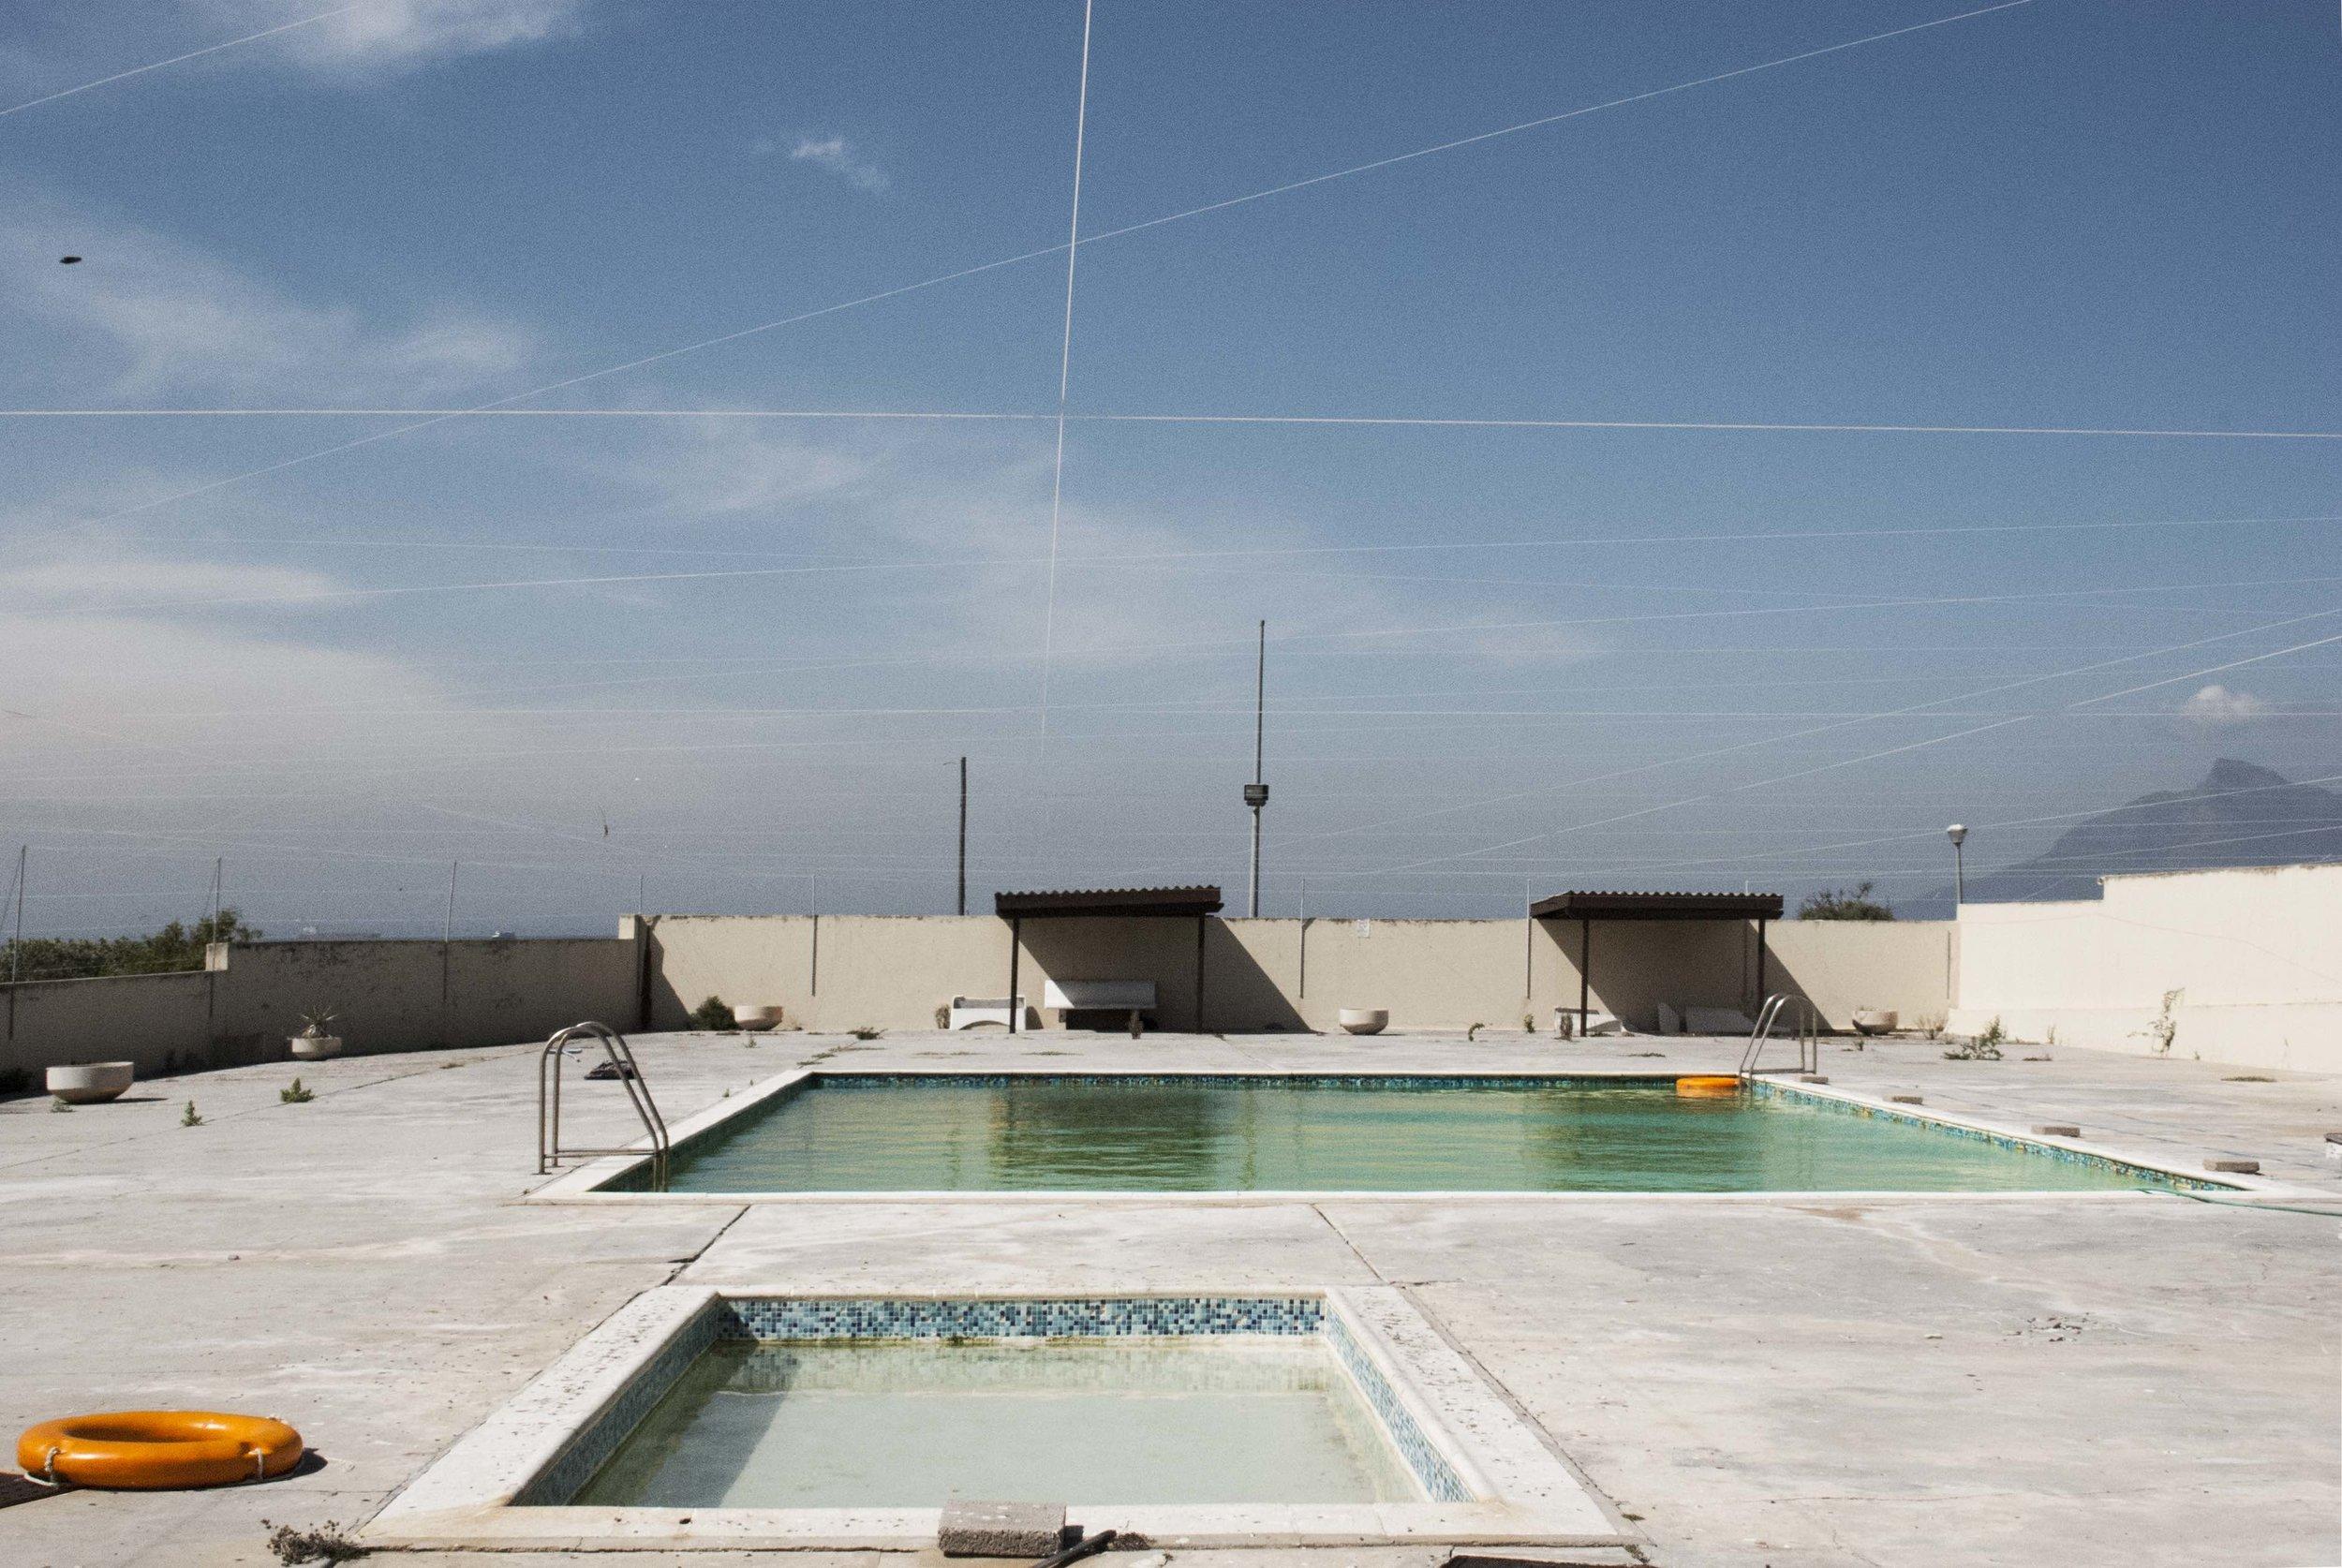 Swimming Pool I, Robben Island 2018